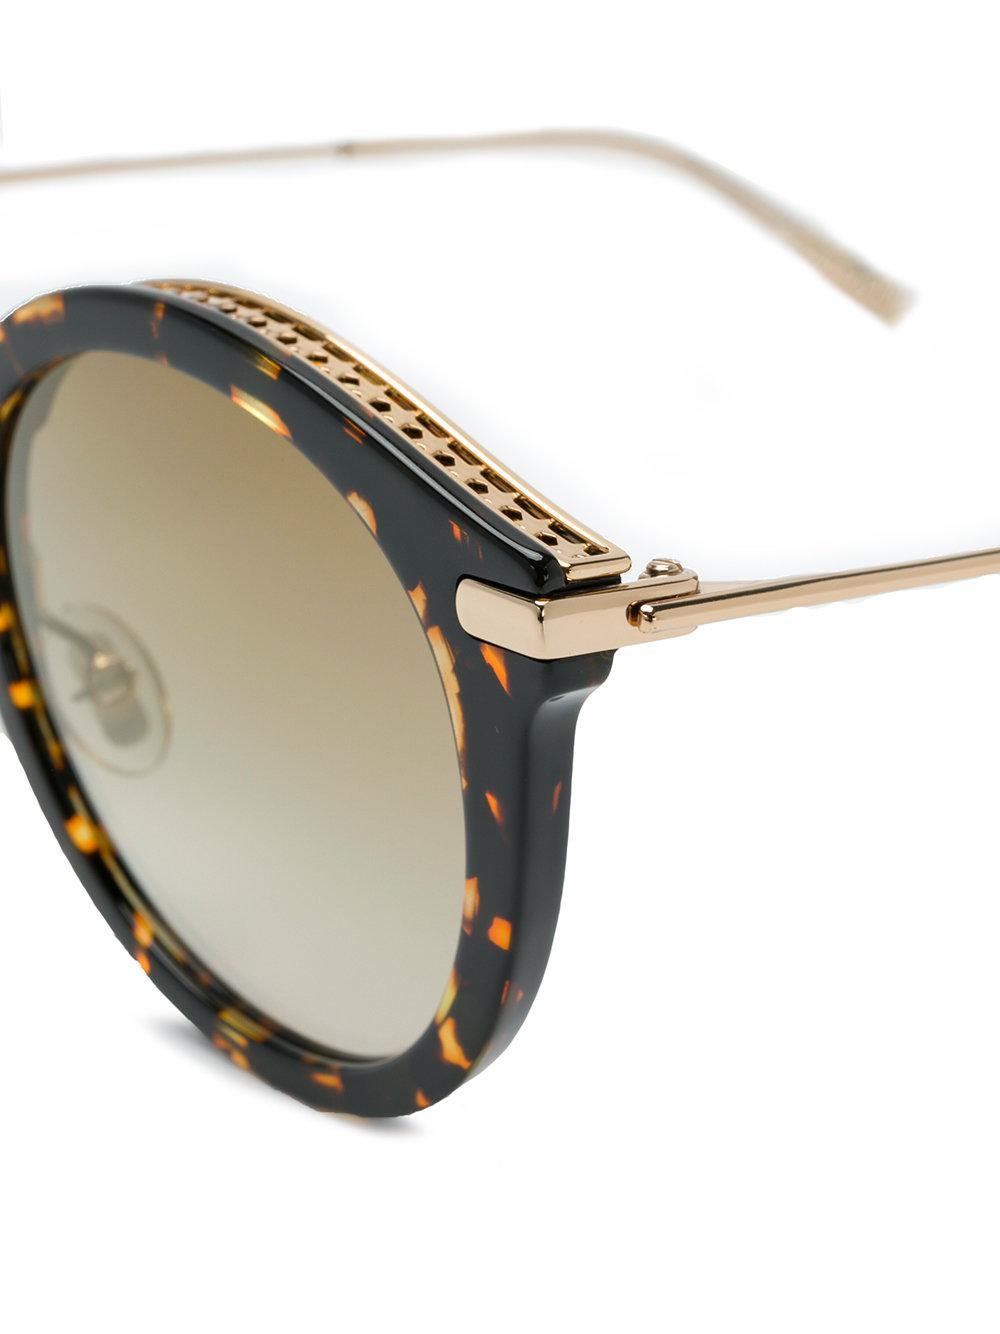 Jimmy Choo Bobby Tortoiseshell Sunglasses in Brown